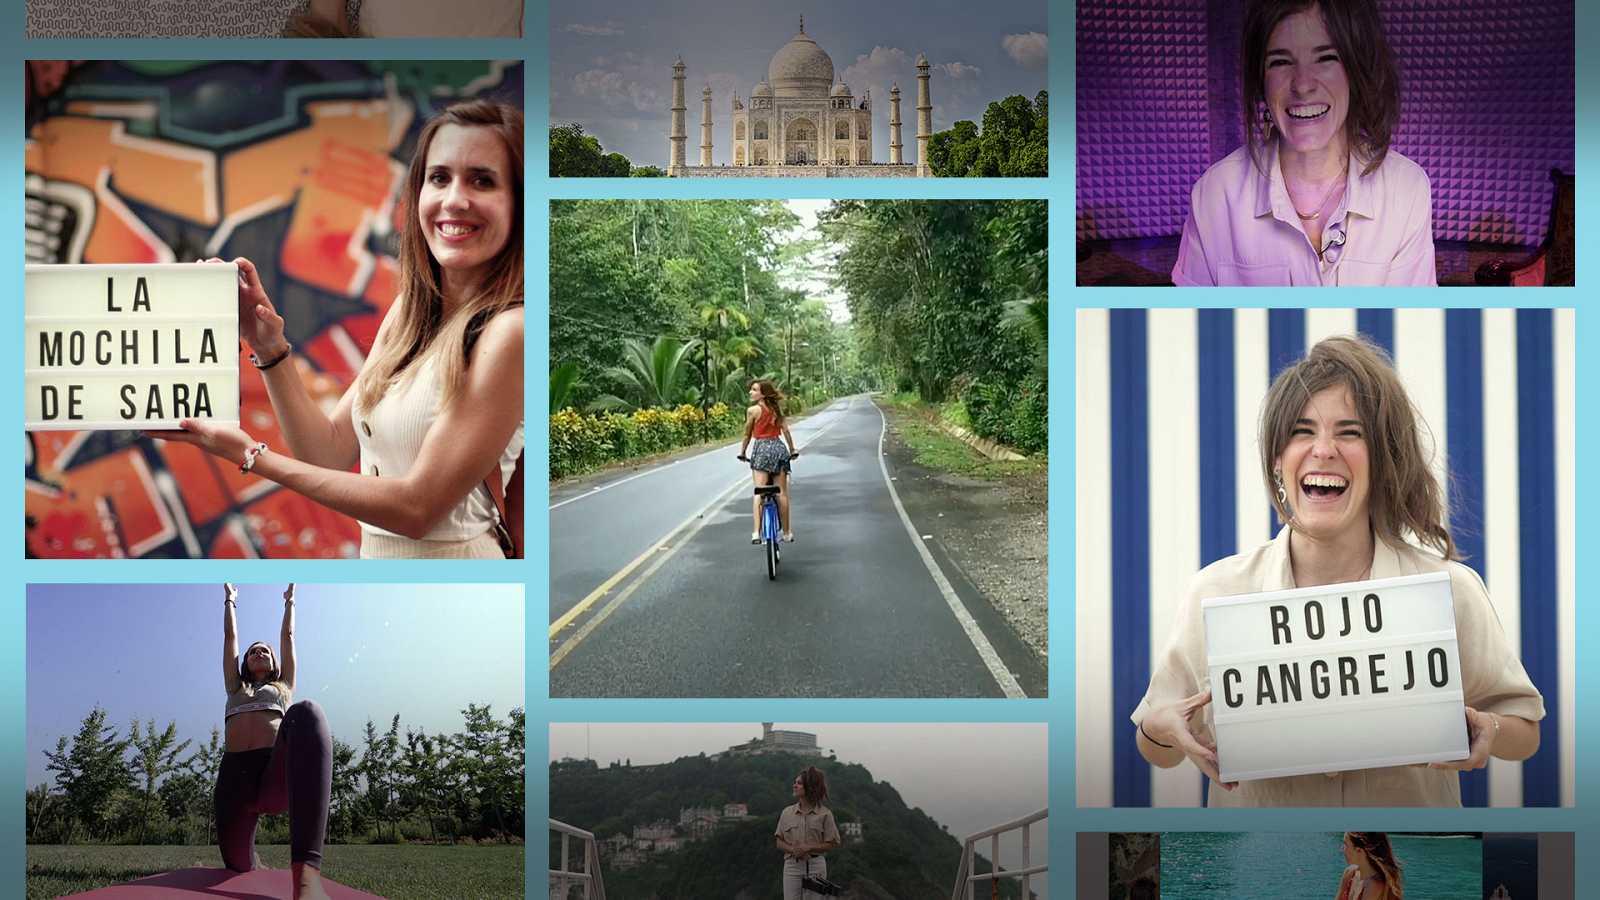 Millennial Files - Programa 4 - Viajeras: Rojo Cangrejo y La mochila de Sara